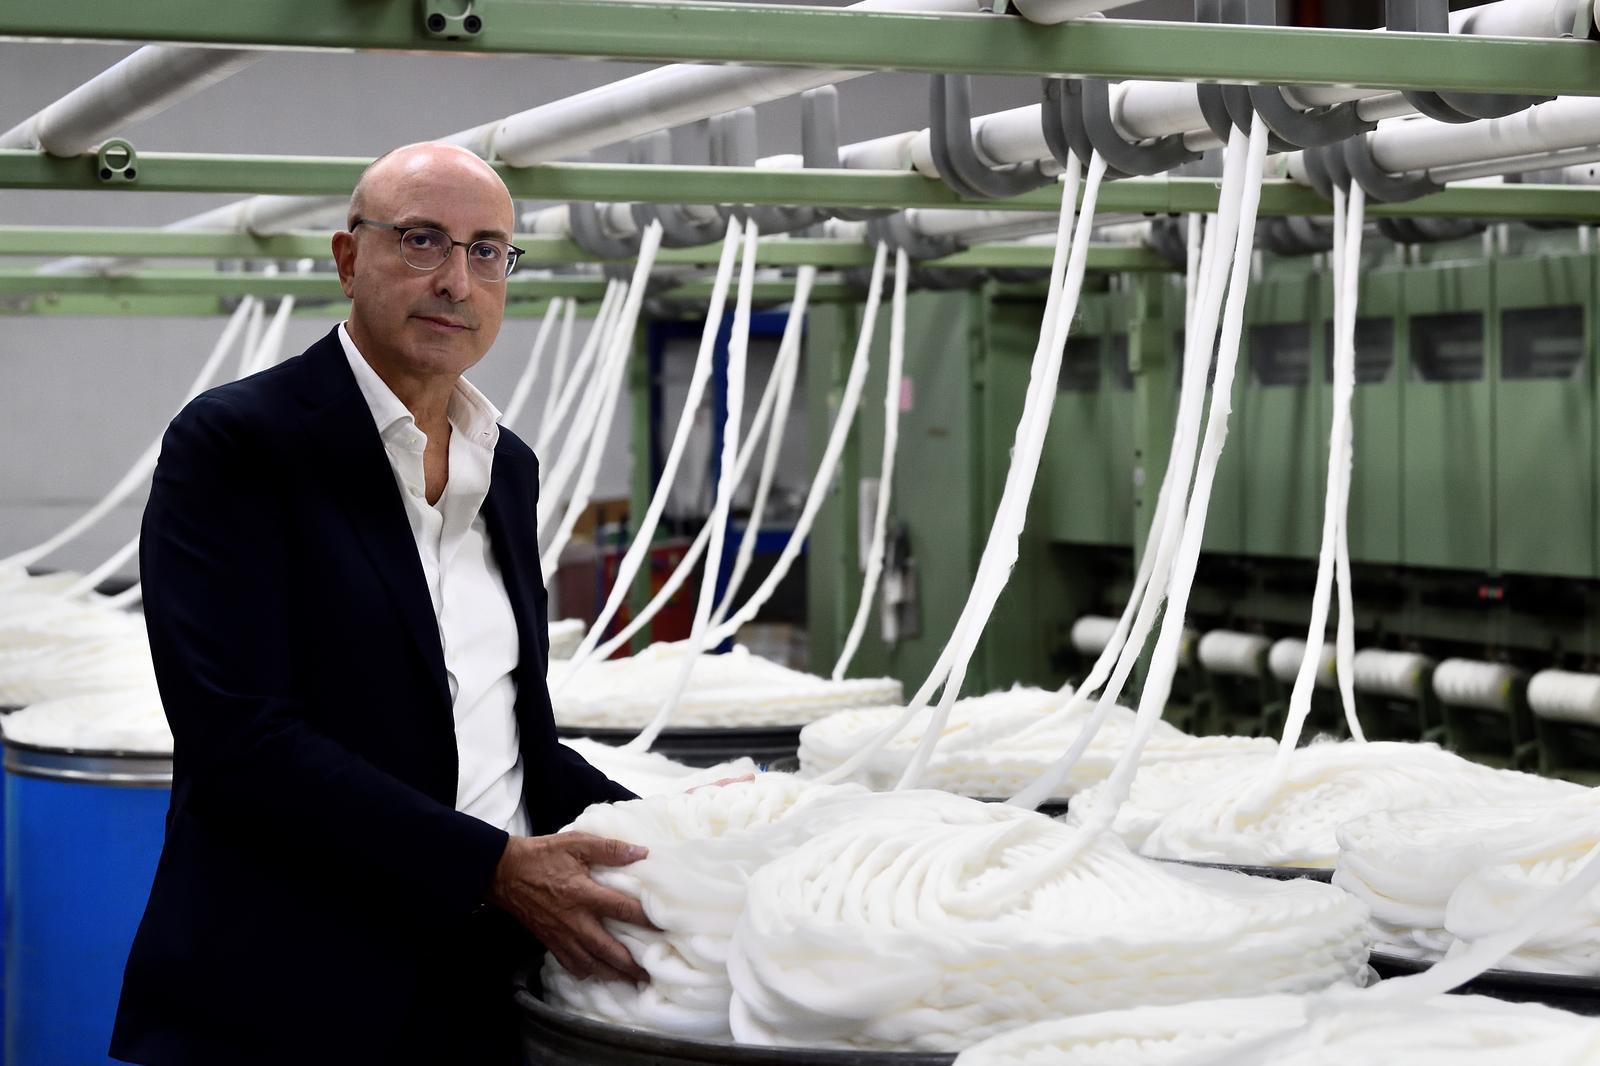 Managing Director Silvio Botto Poala poses for a photograph at Botto Giuseppe & Figli wool mill in Valdilana, near Biella, northern Italy, October 8, 2020. Picture taken October 8, 2020. Photo: Reuters